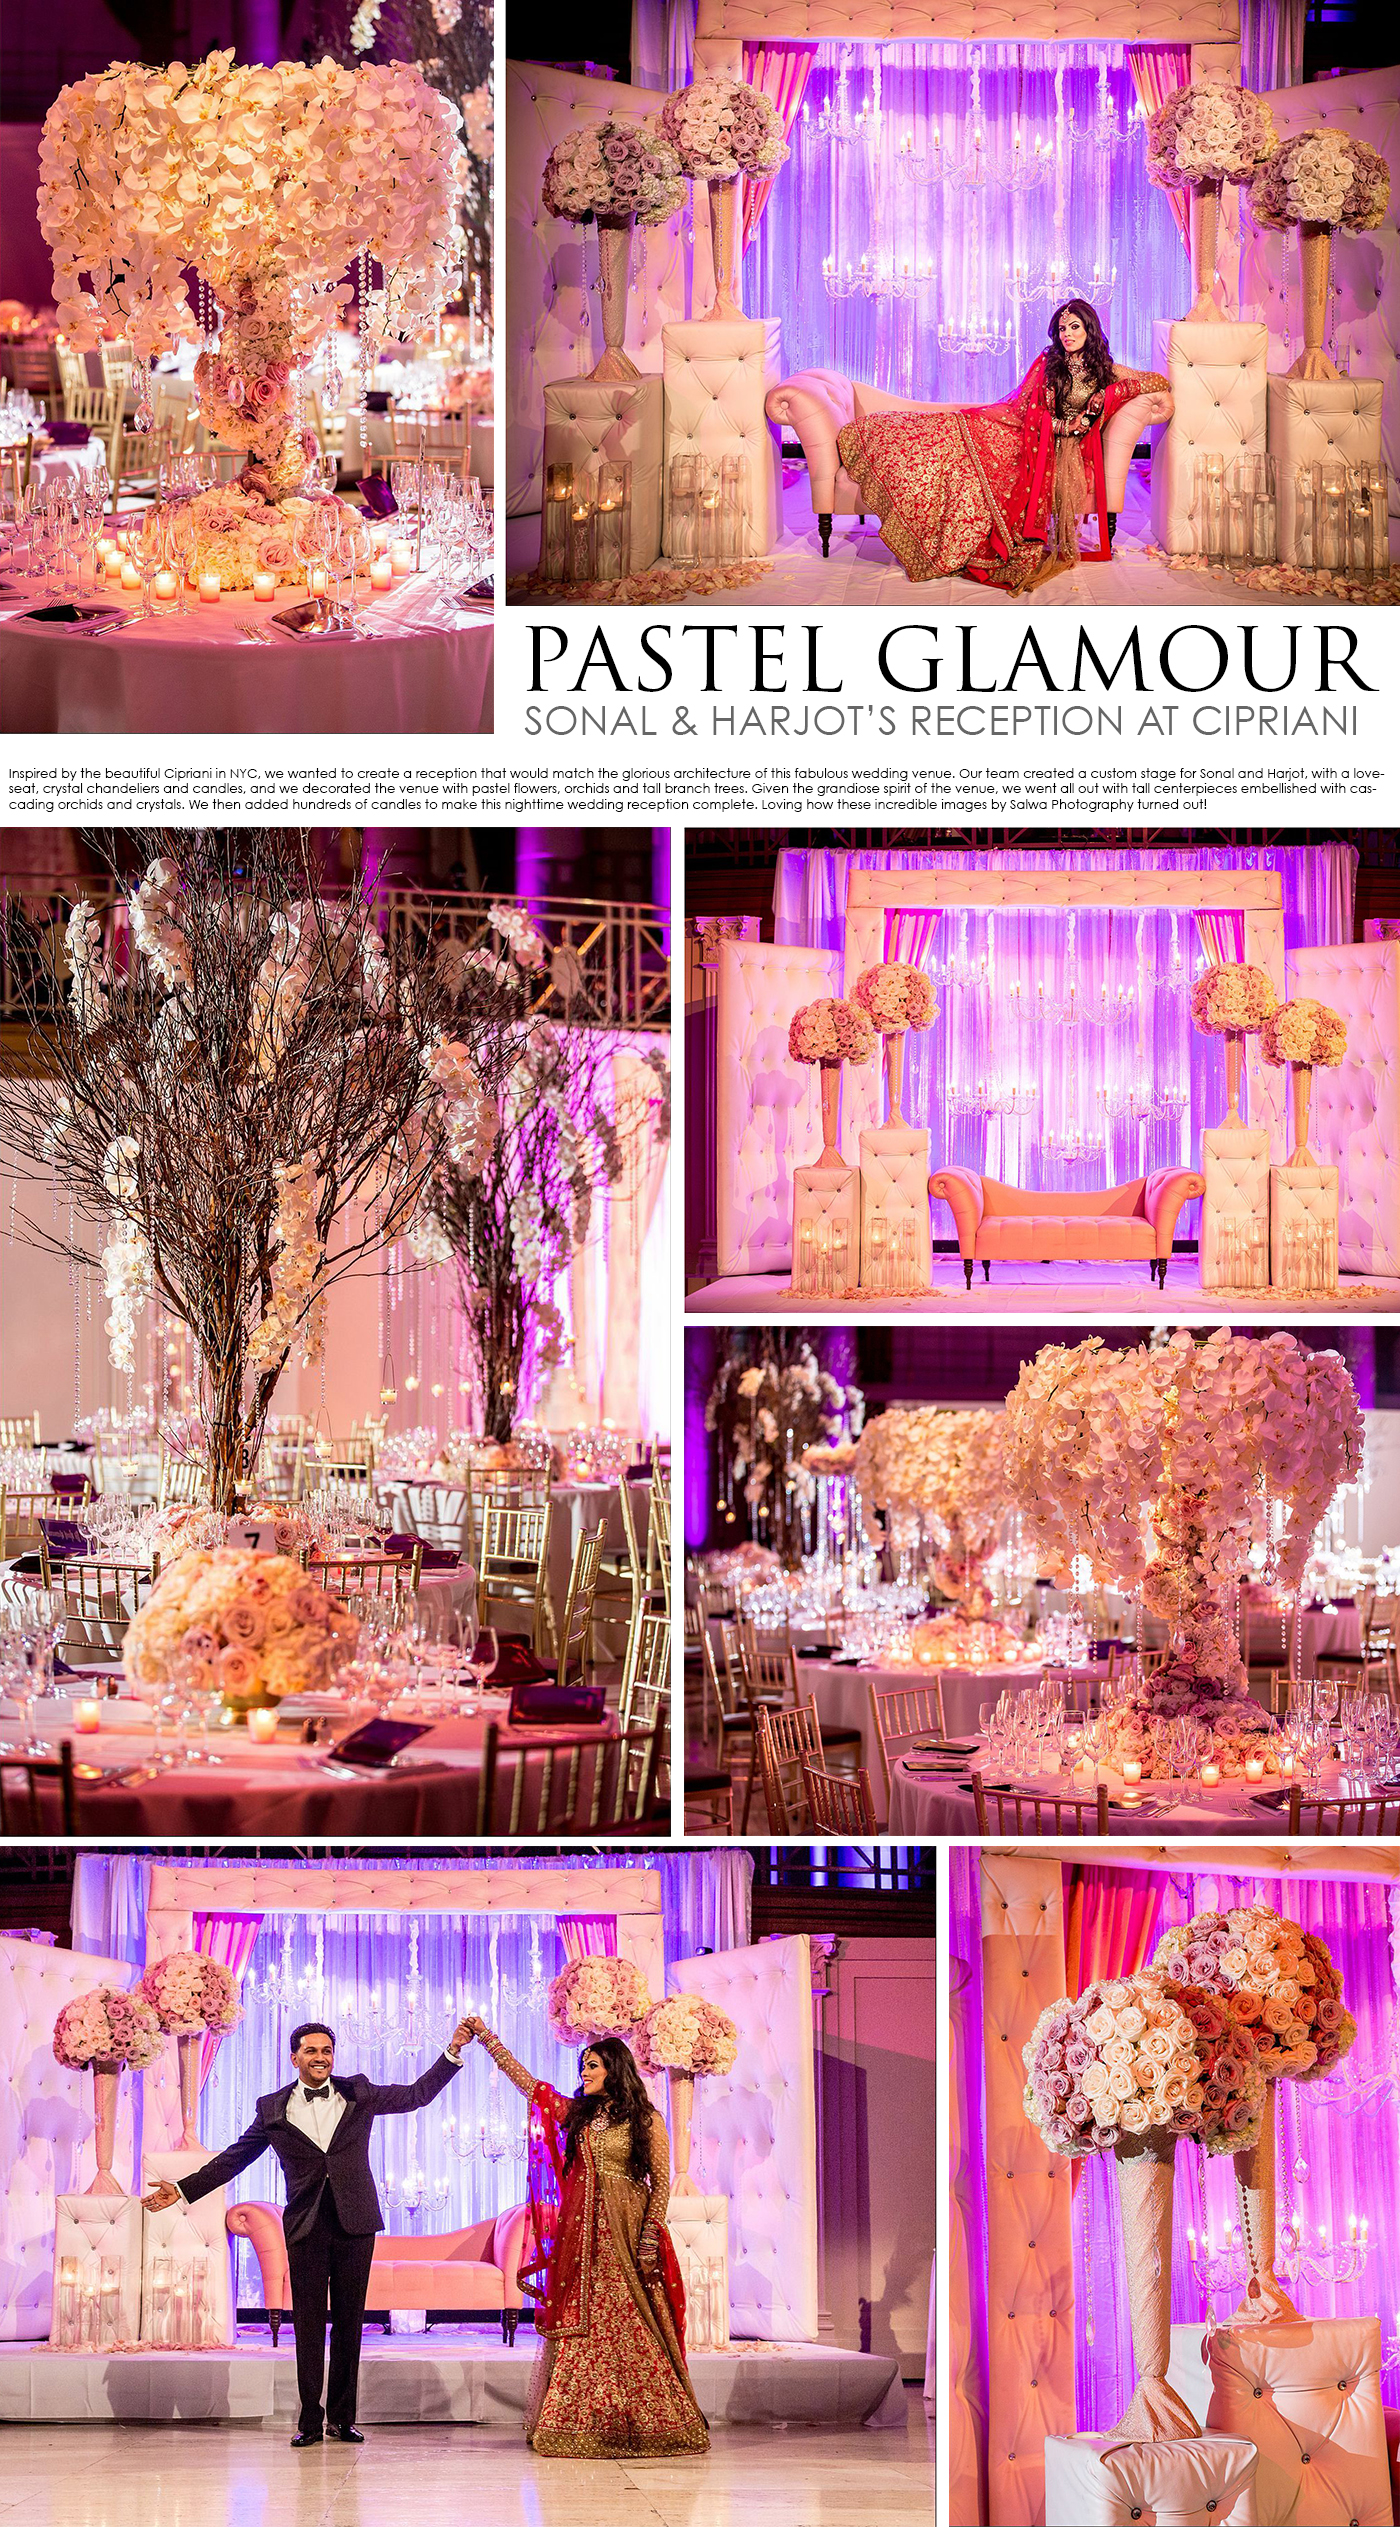 Living Room Design House Decor glamorous pastel reception at cipriani design house decor glamour wedding by decor